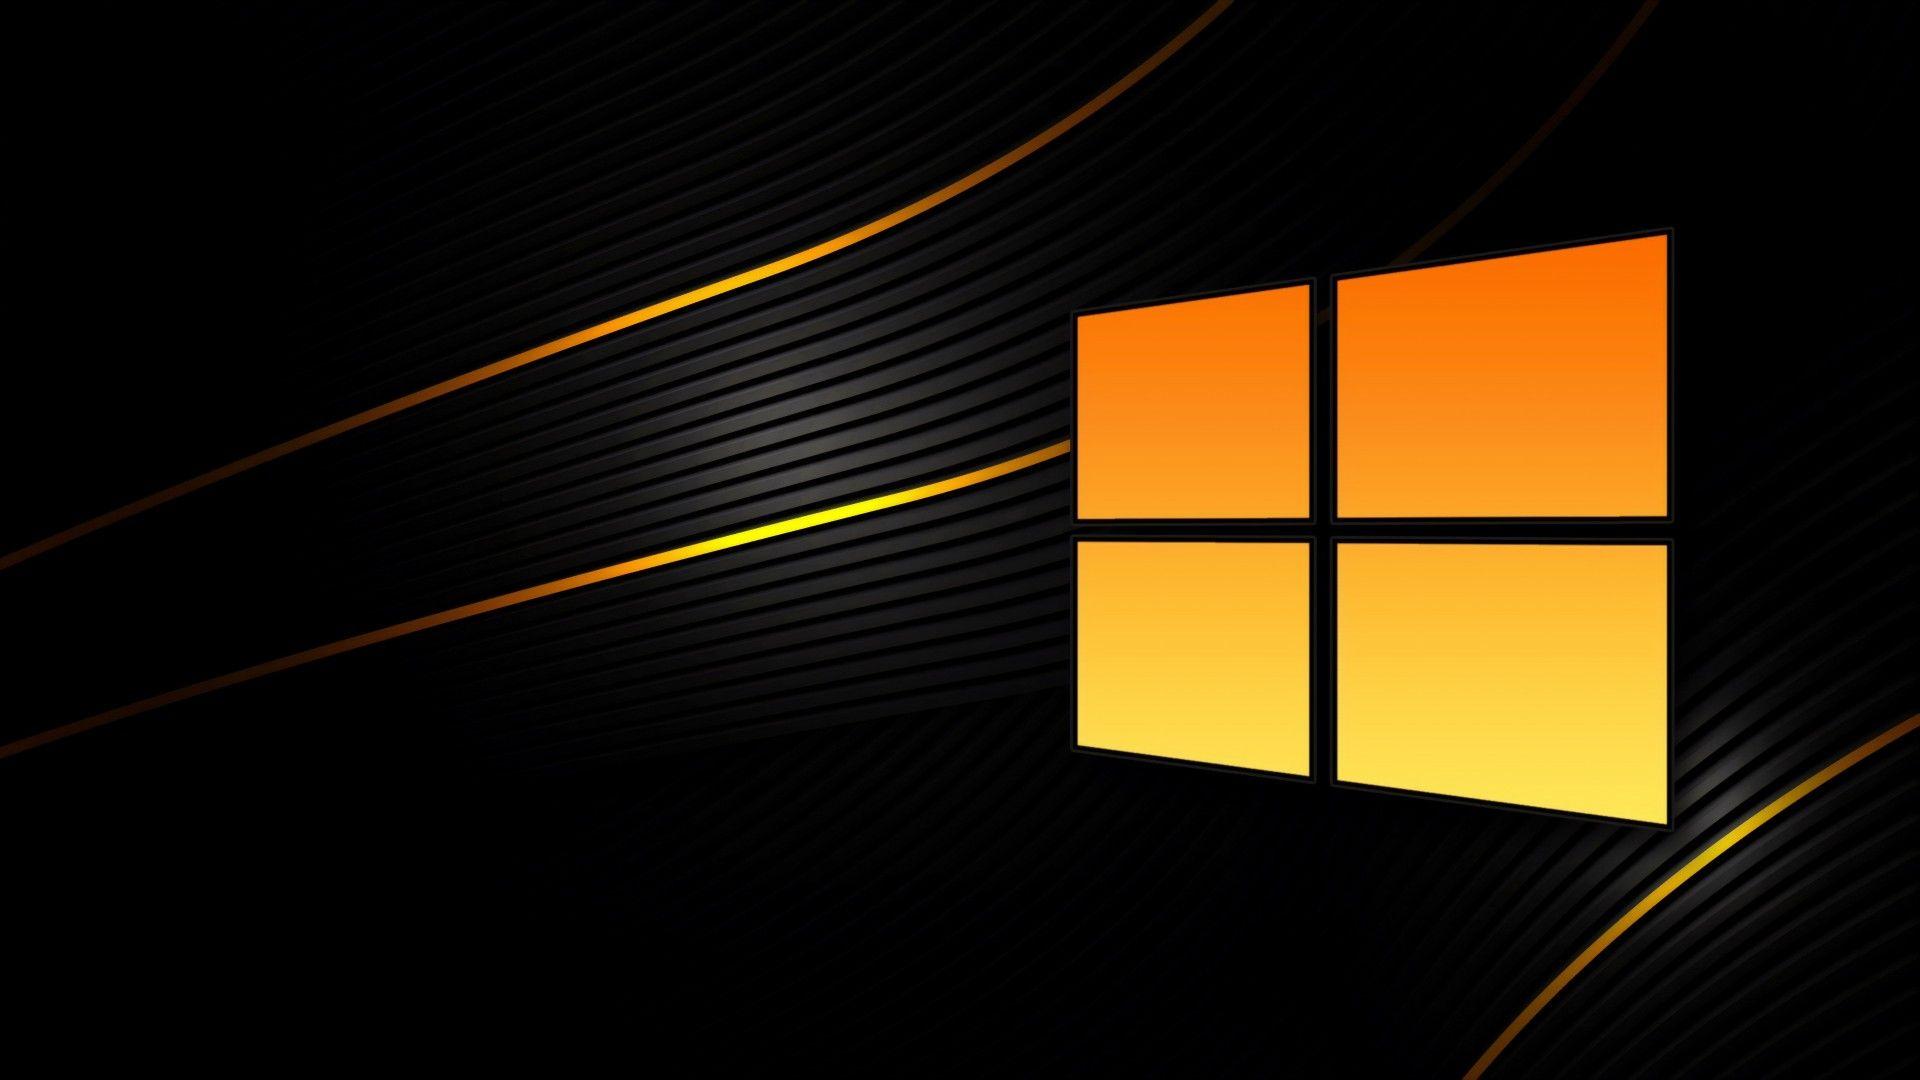 Windows 10 Black1920x1080 Wallpaper Windows 10 Orange